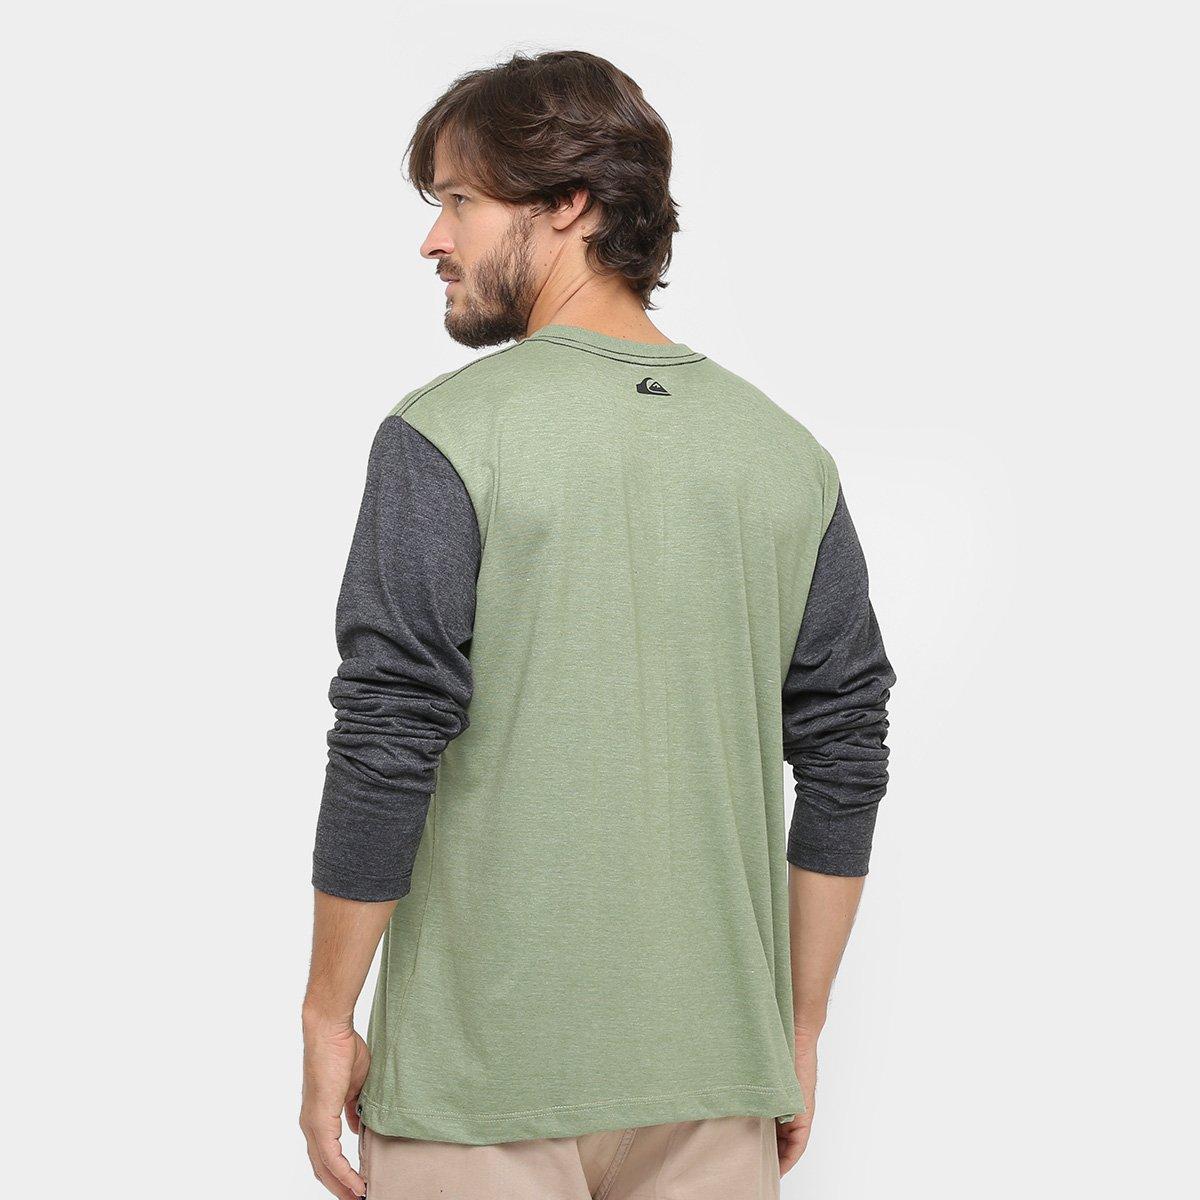 Camiseta Quiksilver Basica Colors Manga Longa - Compre Agora   Netshoes b37f265783